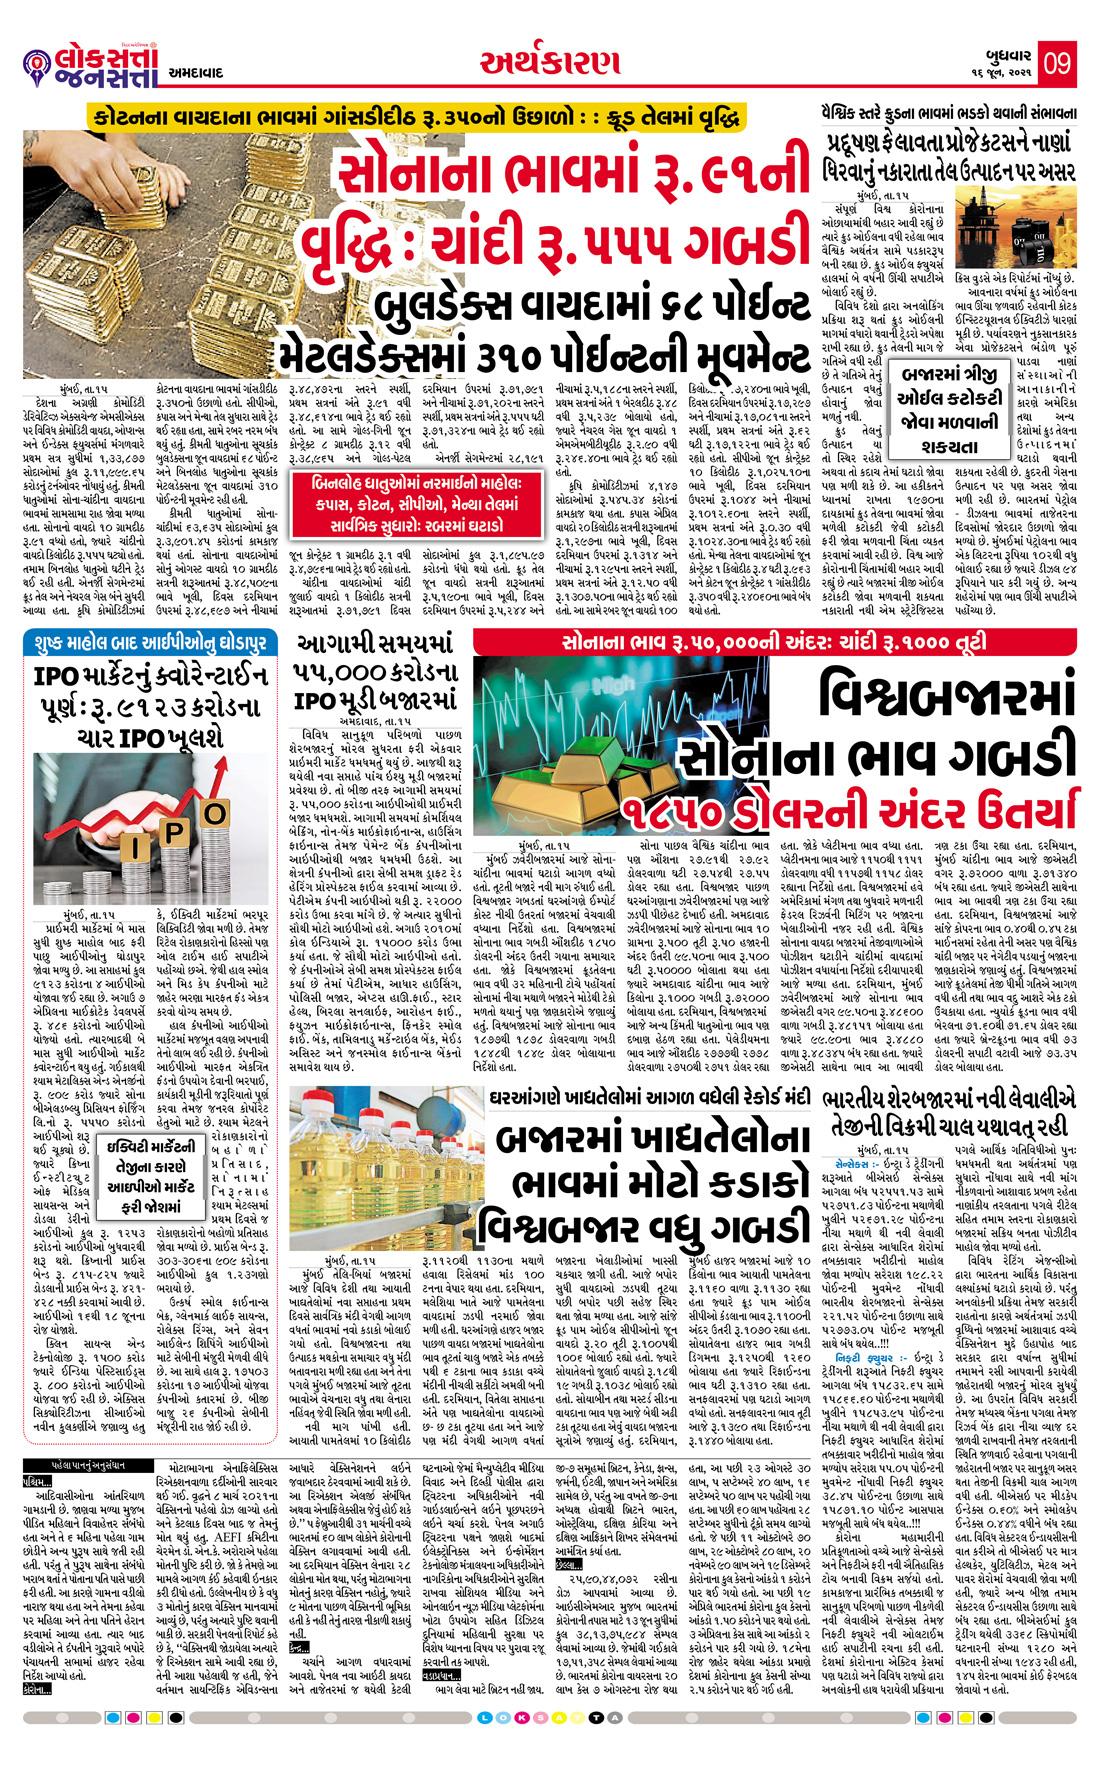 Loksatta Jansatta News Papaer E-paper dated 2021-06-16 | Page 9